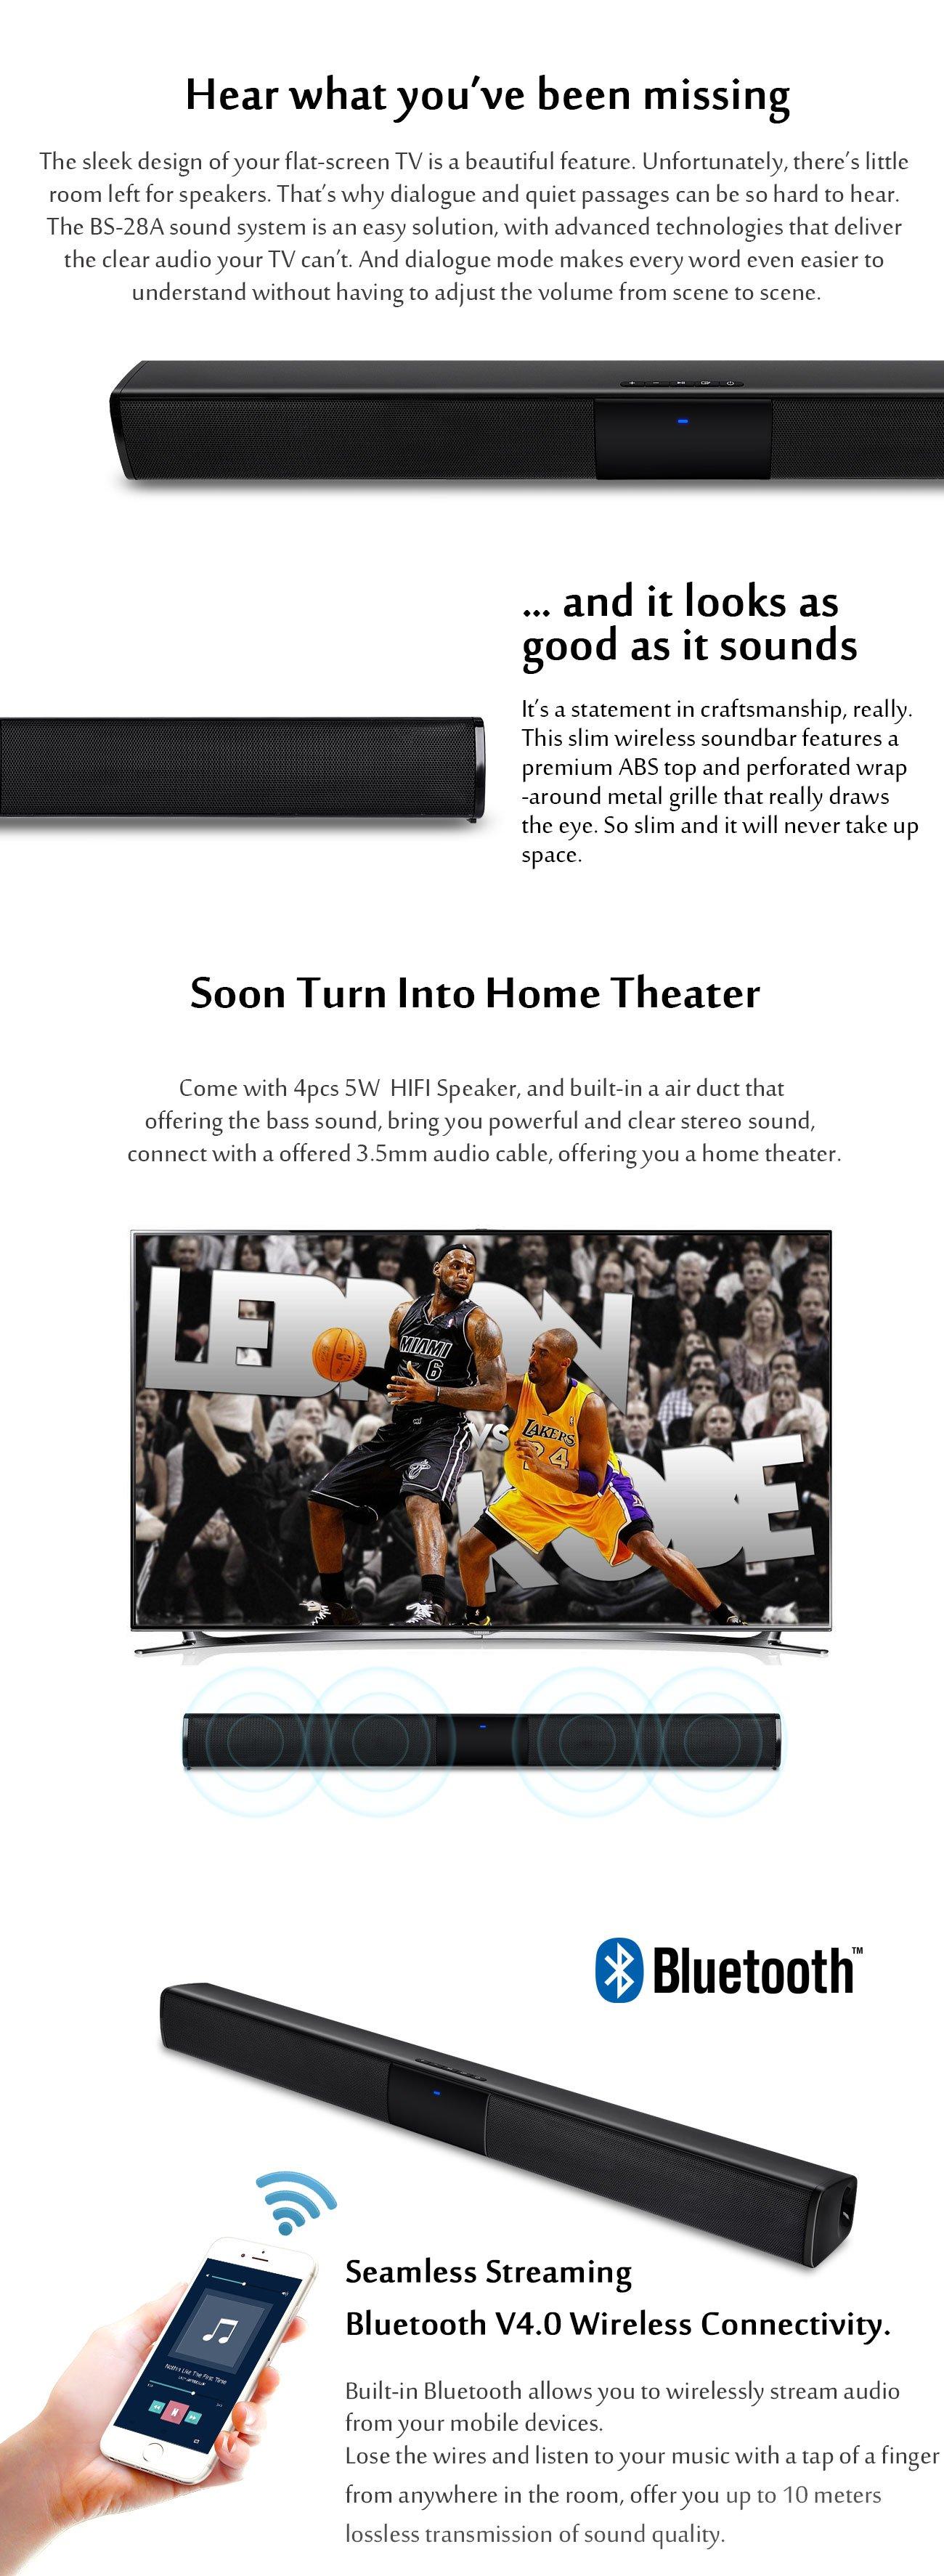 XGODY TV Home Theater Soundbar Wireless 3D Sound Bar Speaker System Stereo HIFI